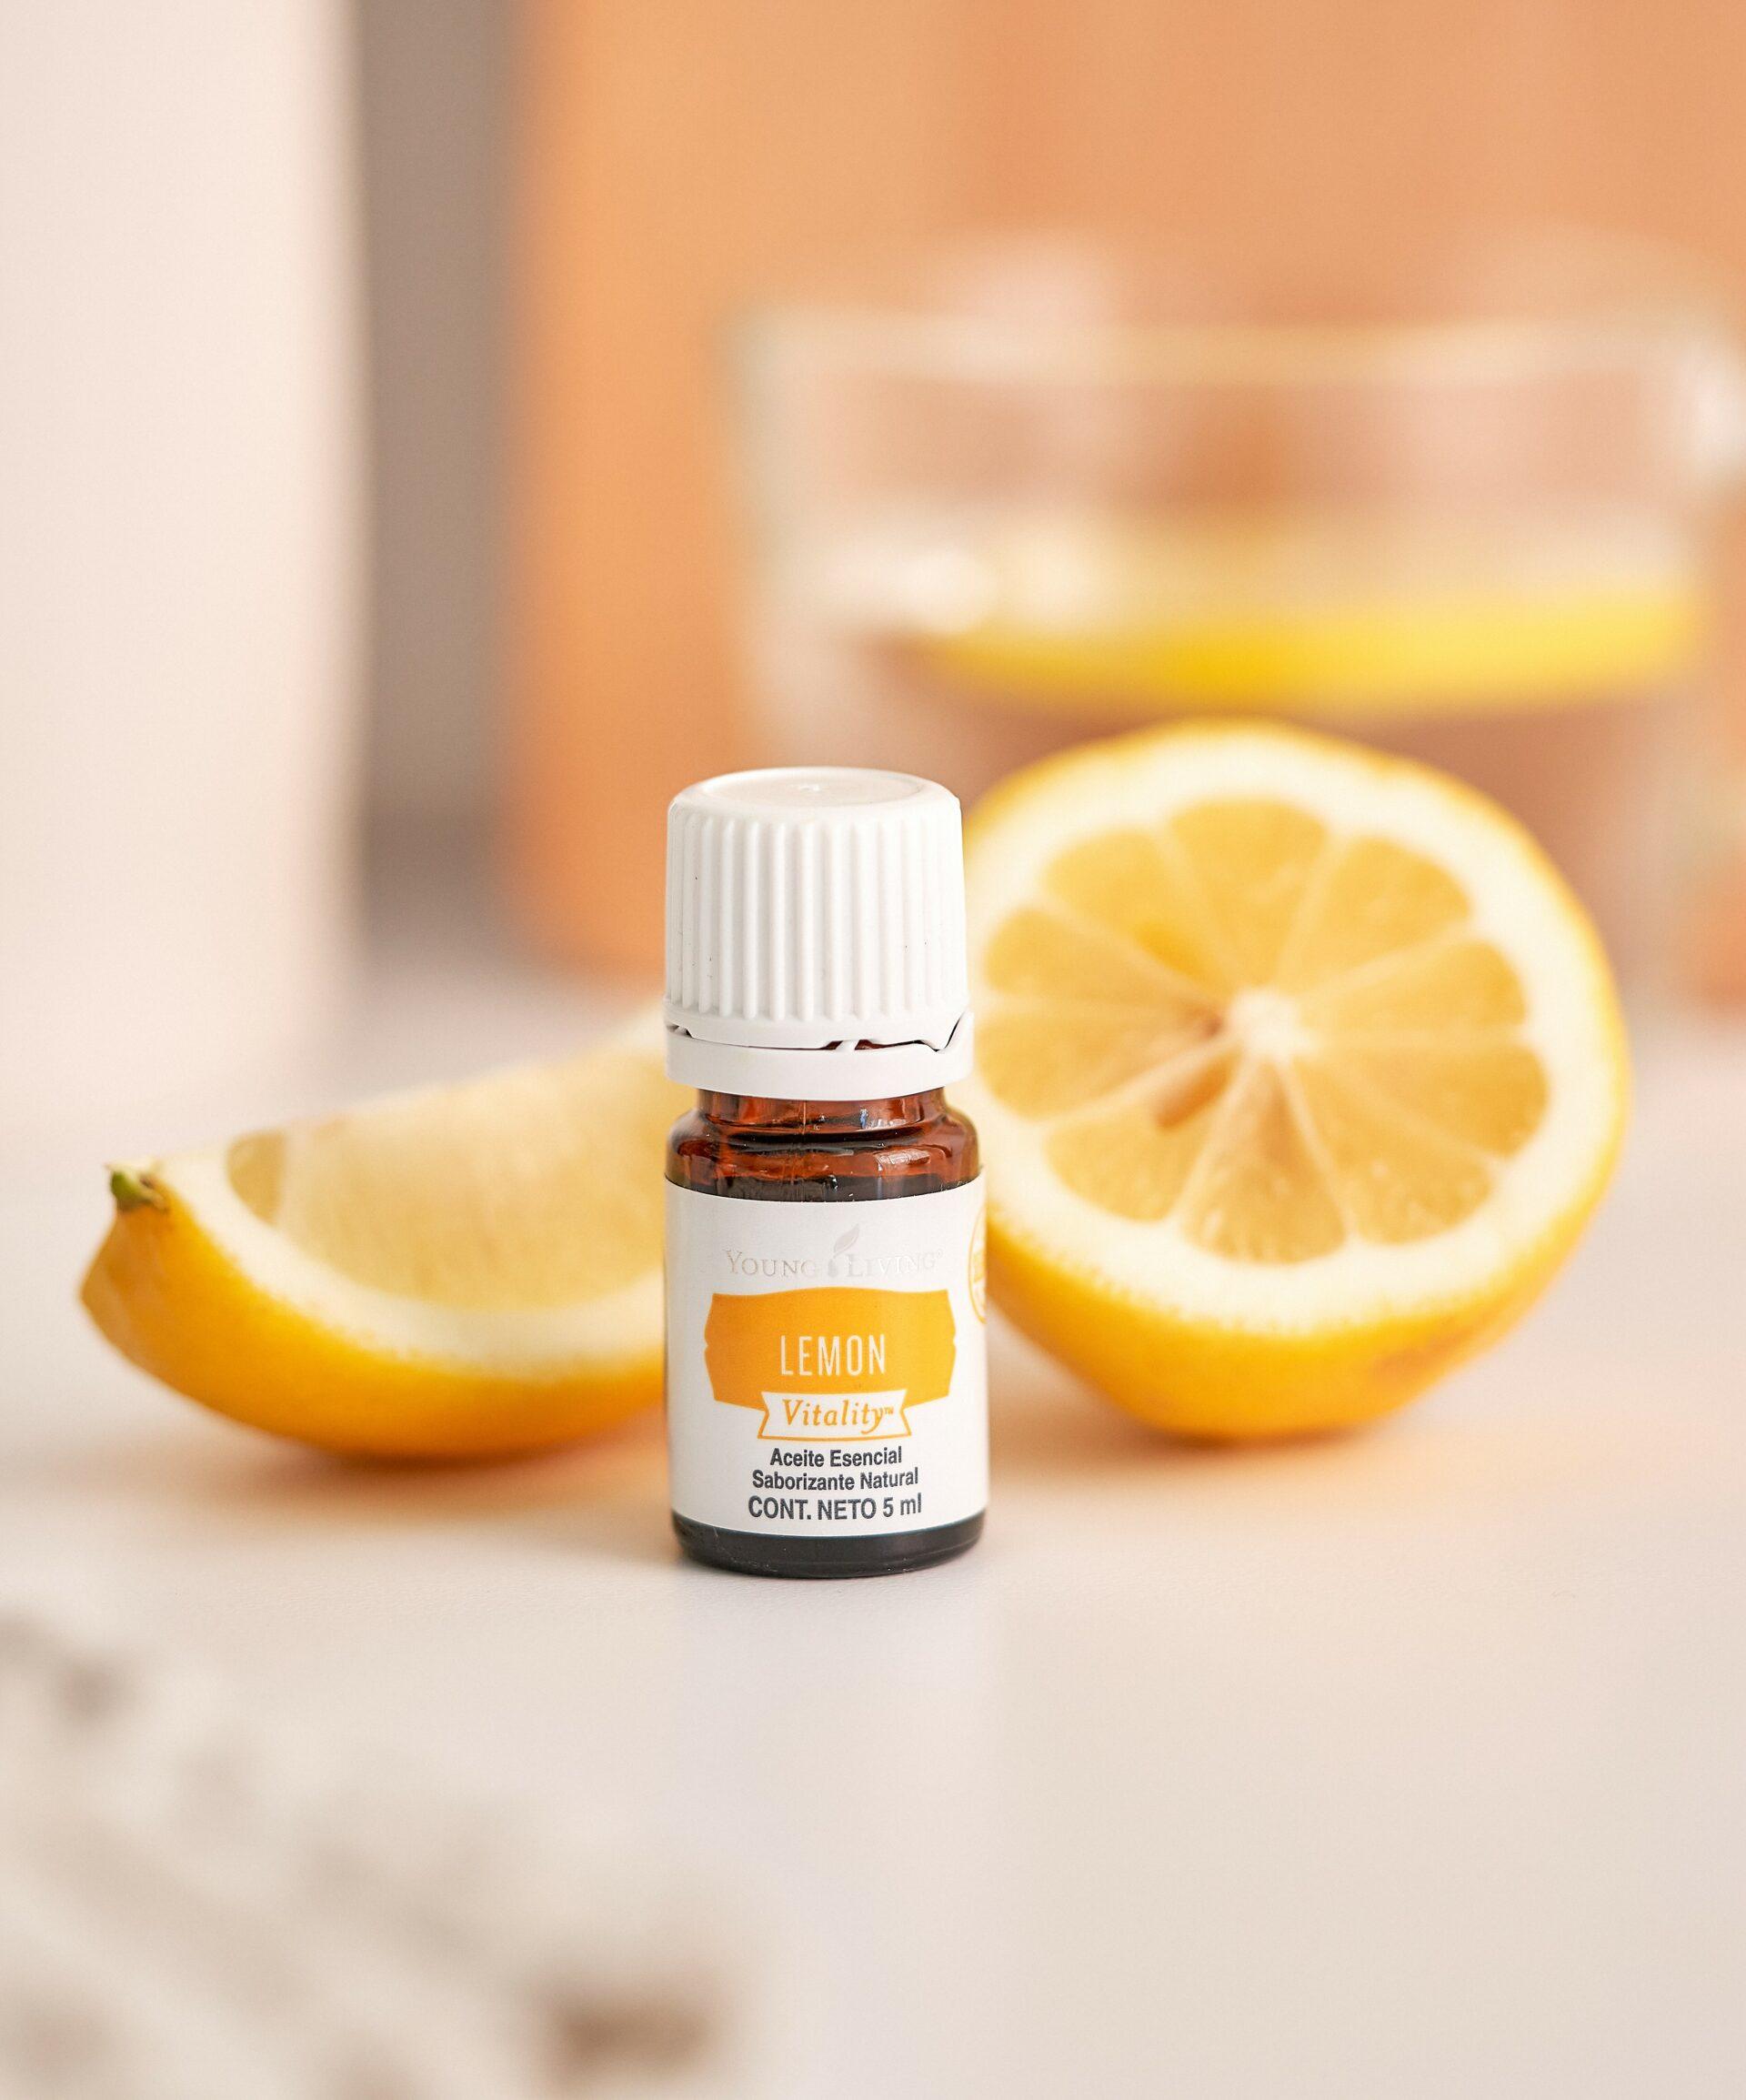 Lemon Vitality - Young Living Essential Oils